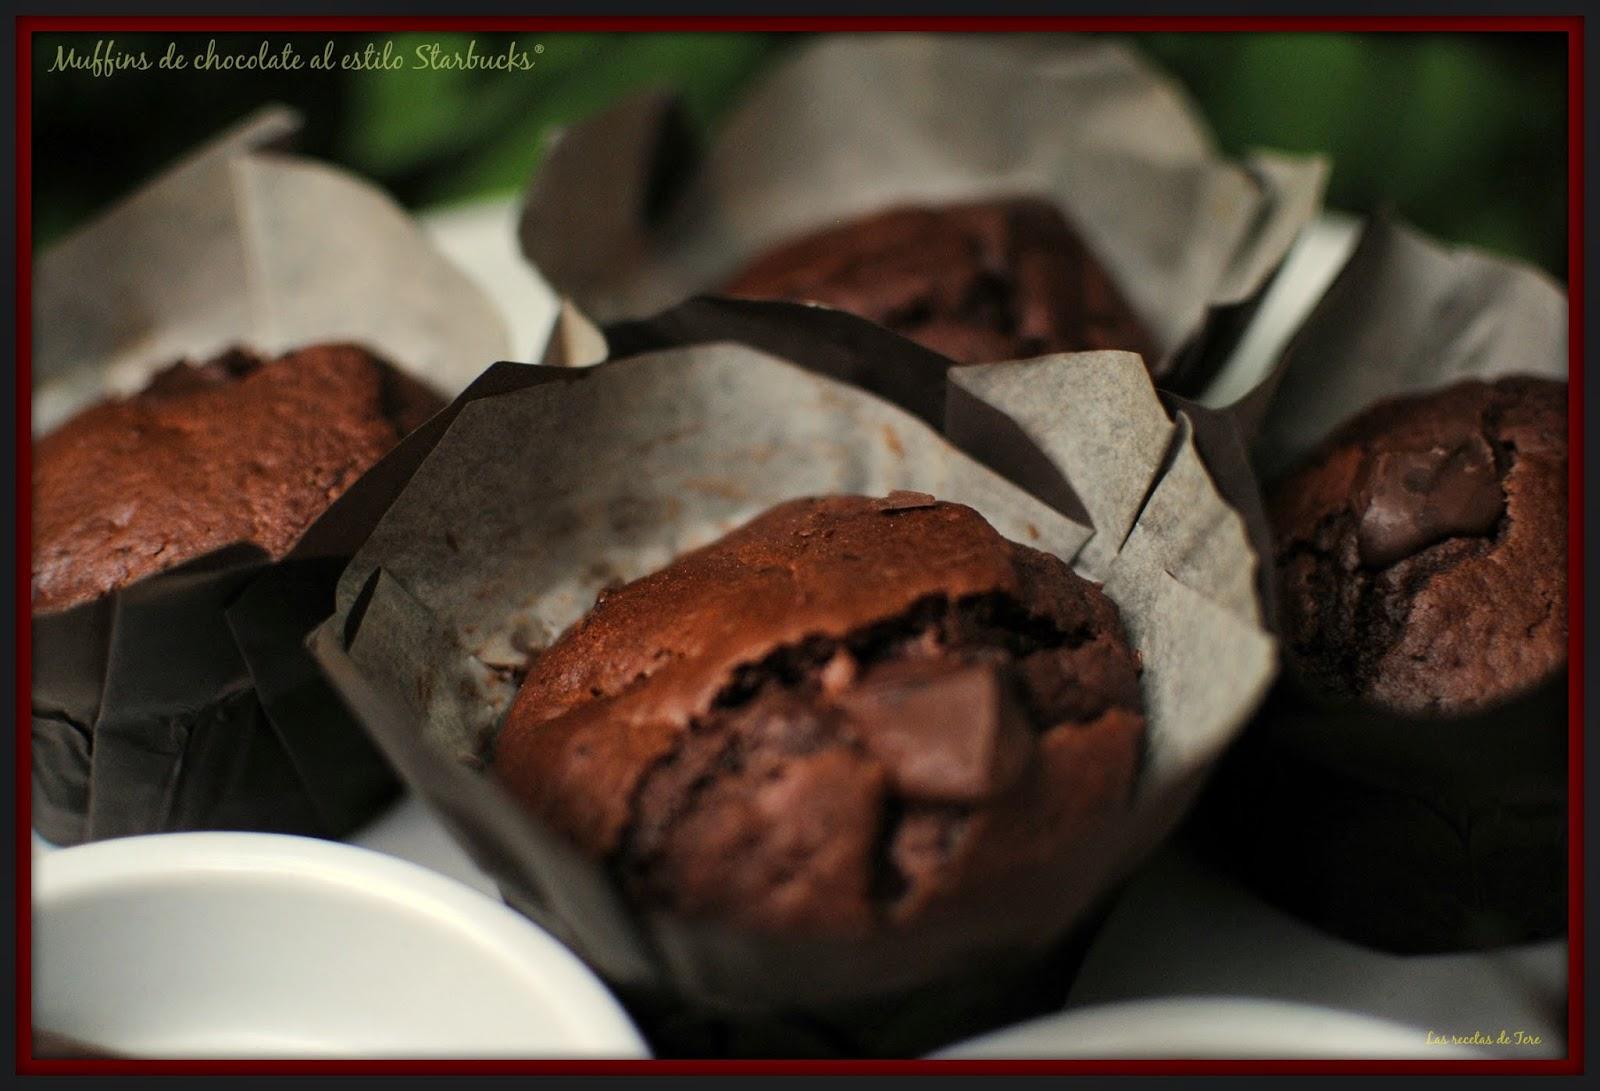 muffins de chocolate al estilo starbucks 01